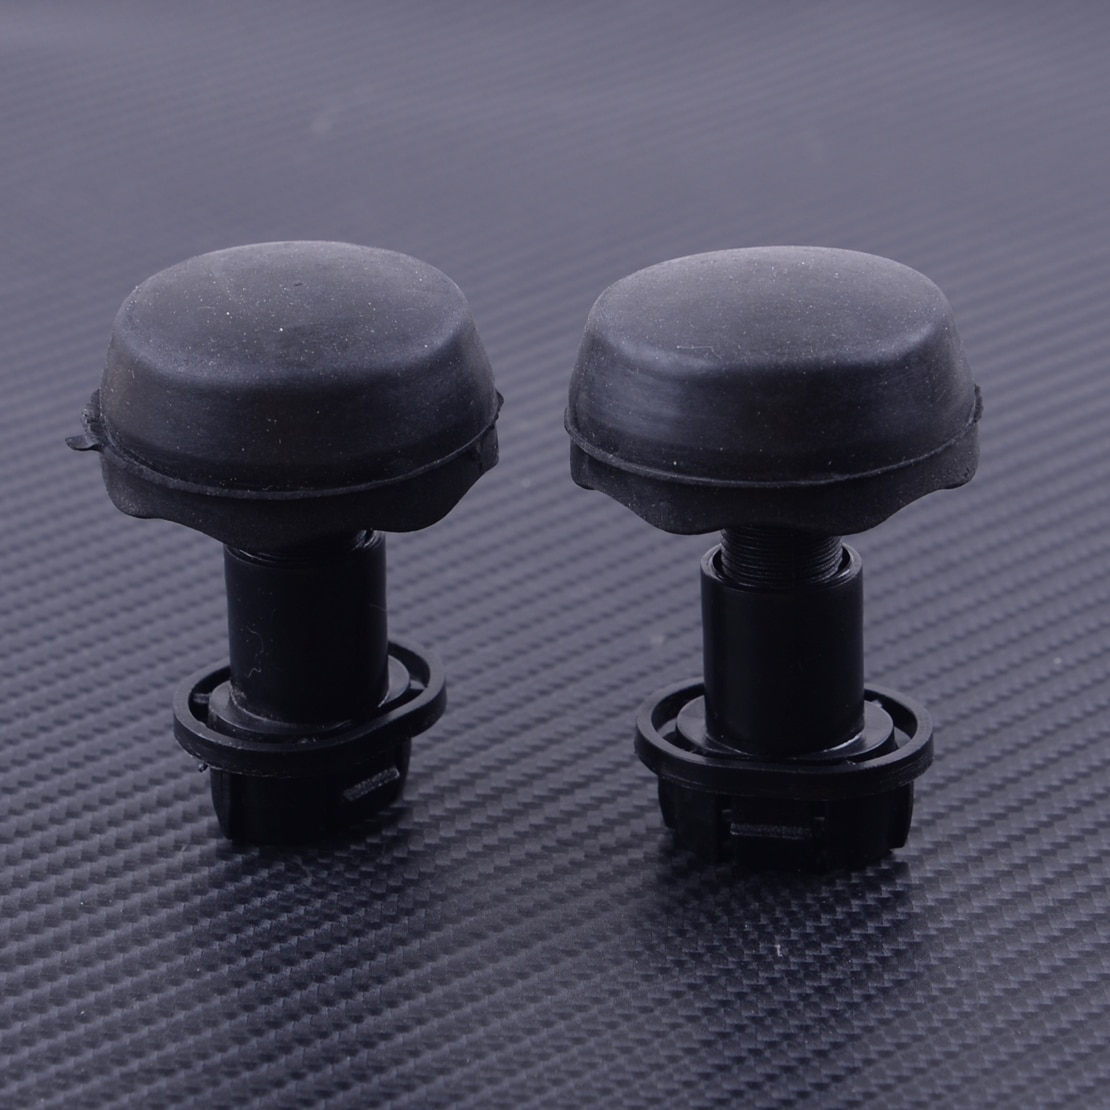 Nuevo amortiguador de goma DWCX 2 uds para Ford c-max Edge Escape Focus Transit Connect CV6Z16758A